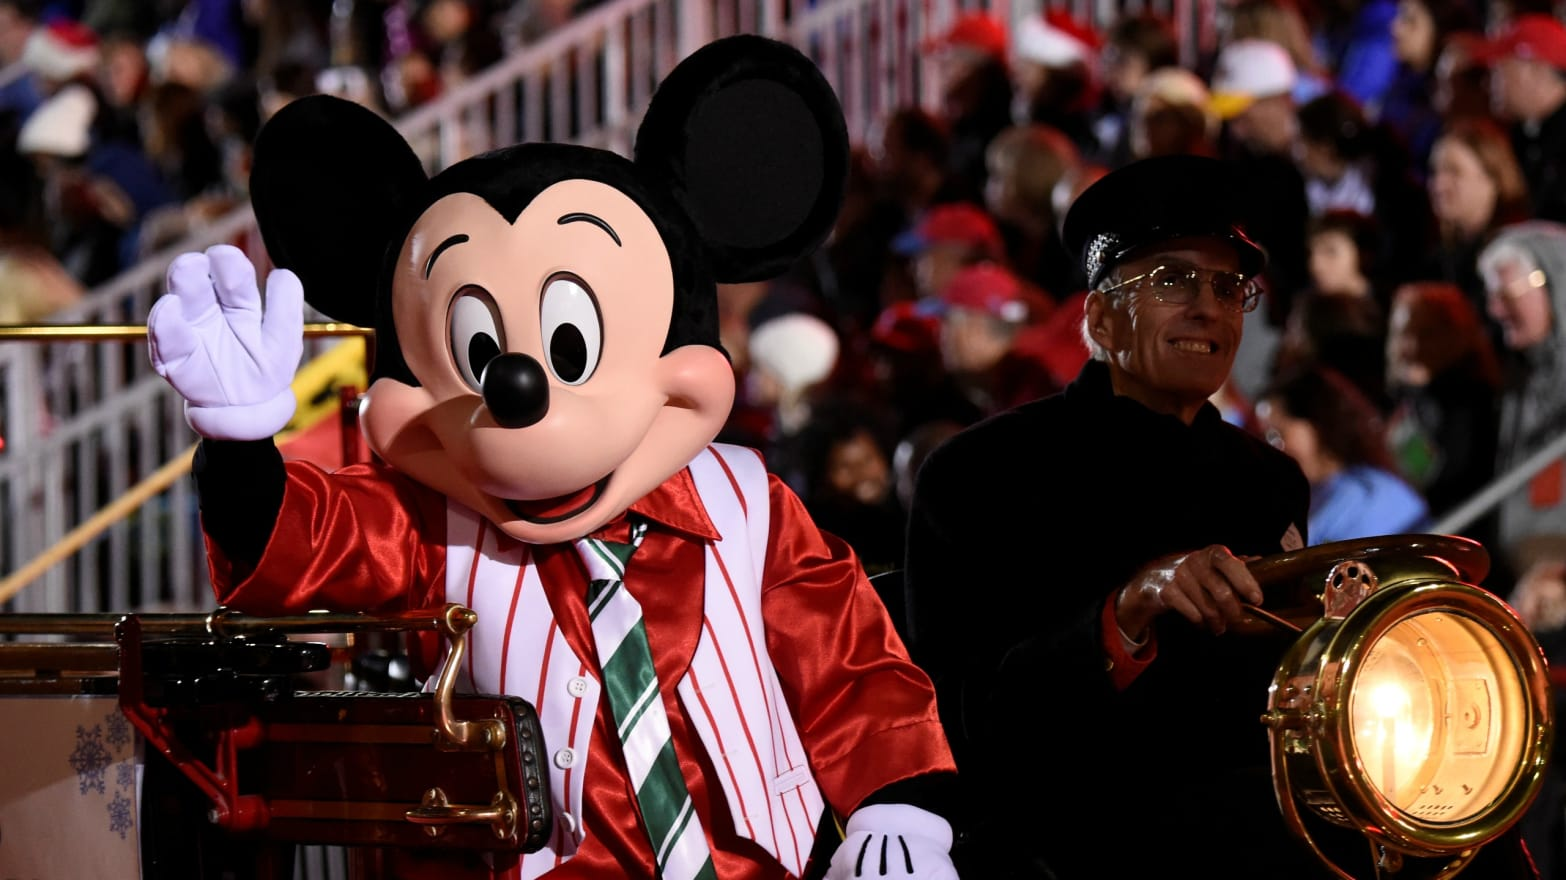 Hollywood Christmas Parade.Live Stream The 2016 85th Anniversary Hollywood Christmas Parade